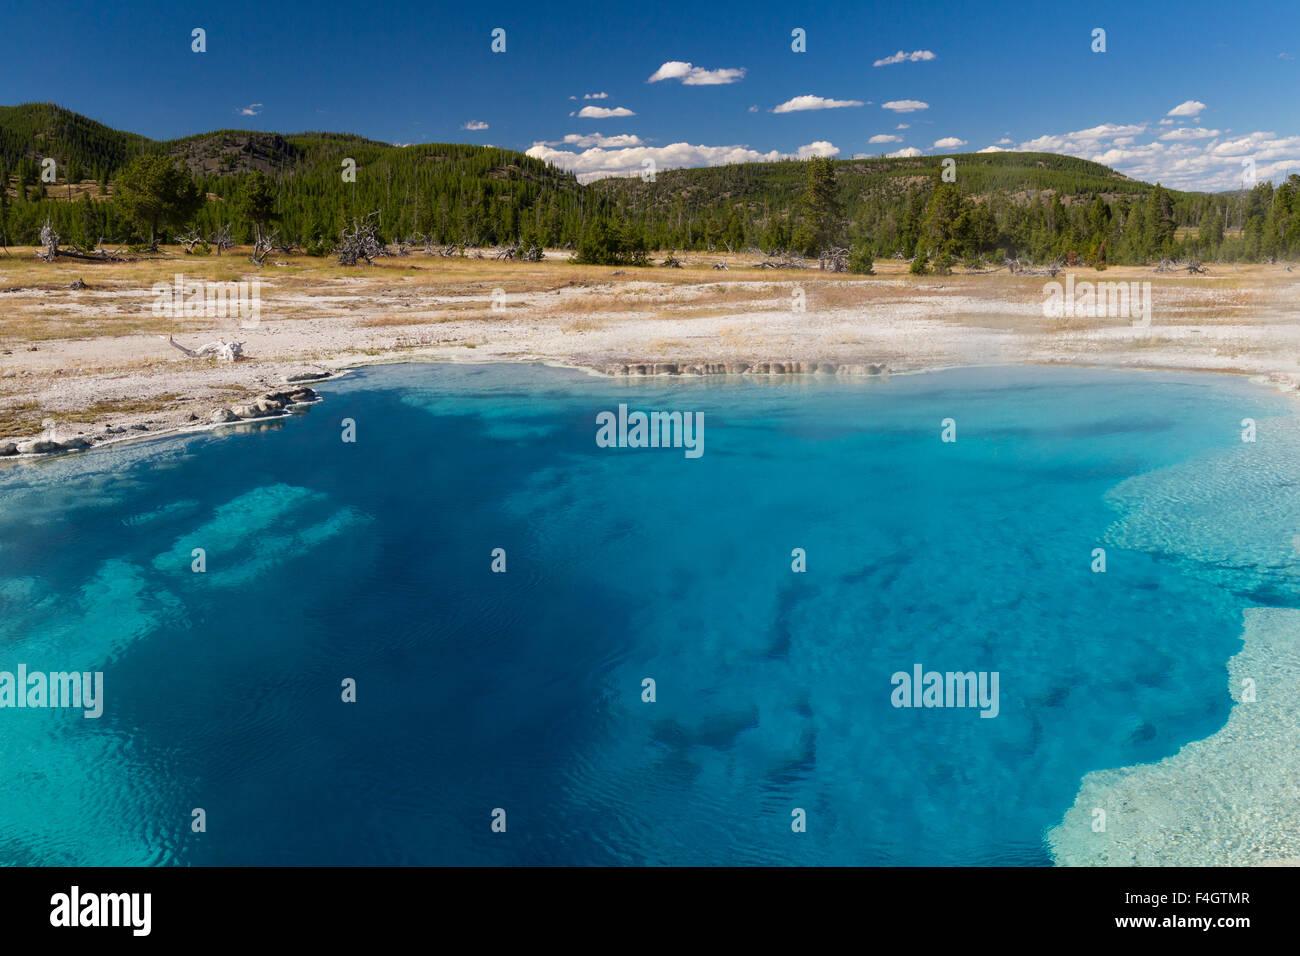 Piscine saphir Biscuit au bassin, le Parc National de Yellowstone, Wyoming, USA Banque D'Images